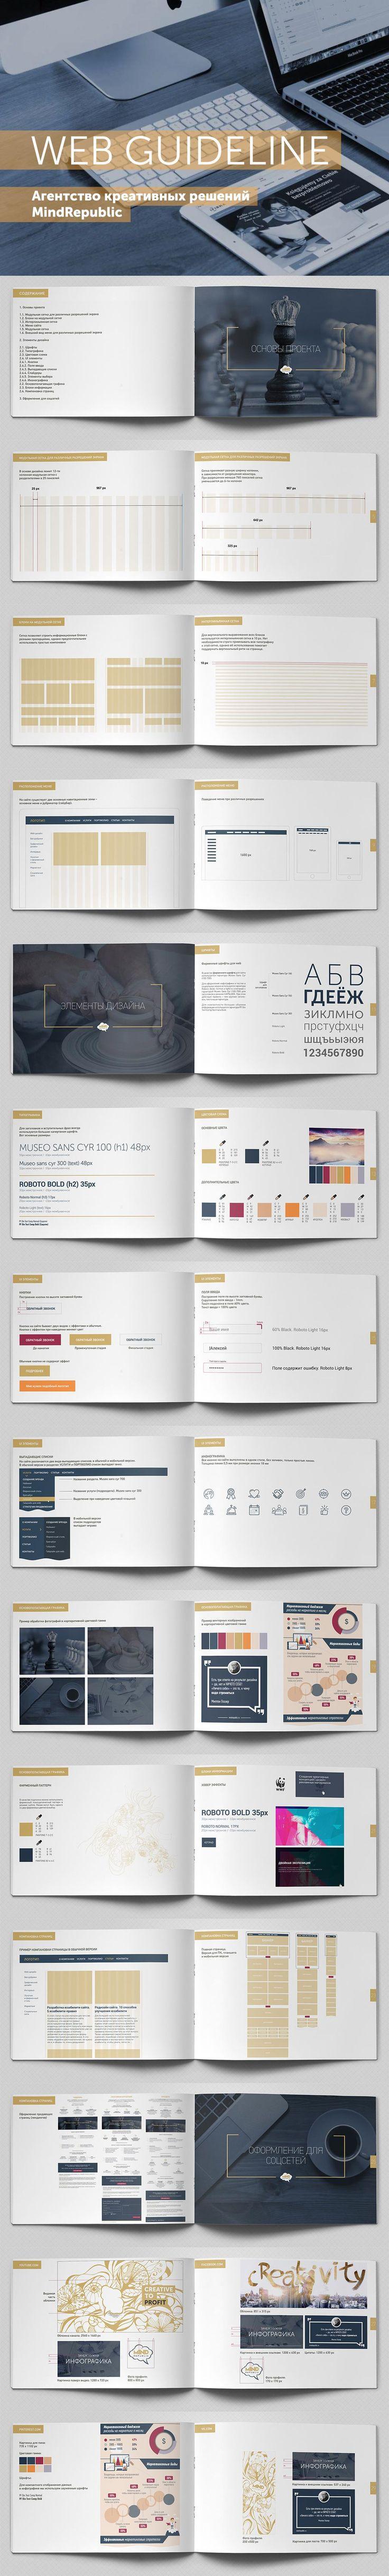 Гайдлайн для веба. Гайдлайн для web. Гайдлайн для сайта. Website guideline